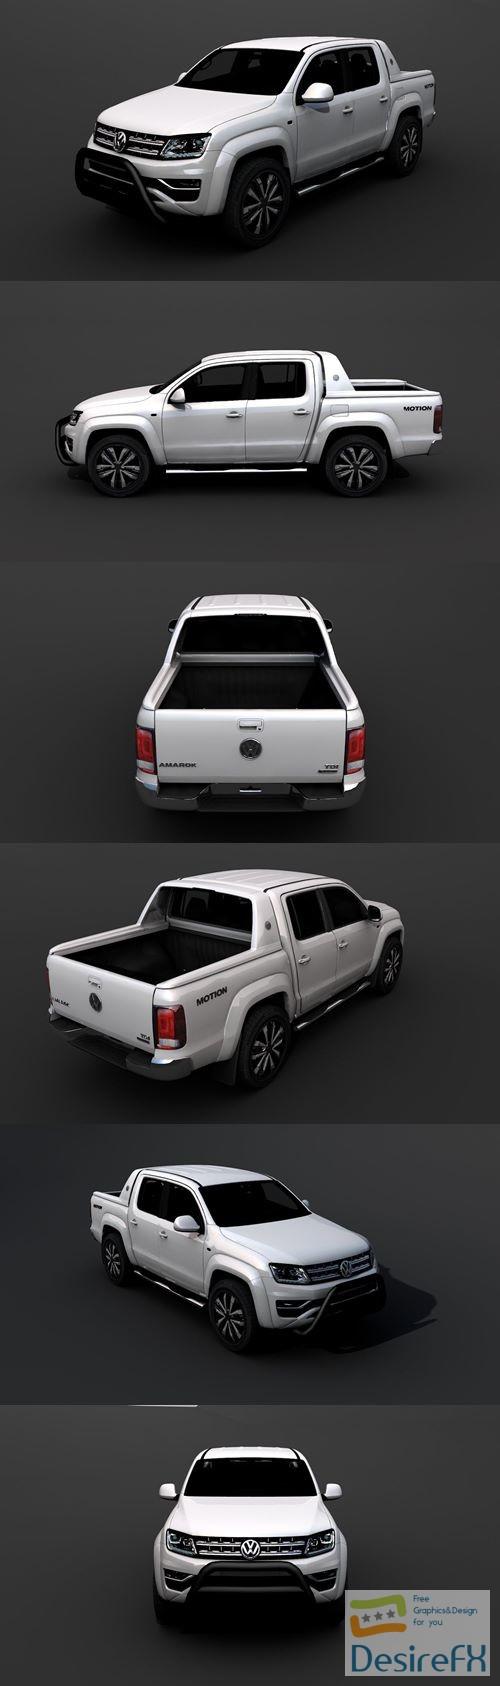 3d-models - Volkswagen Amarok 2017 3D Model